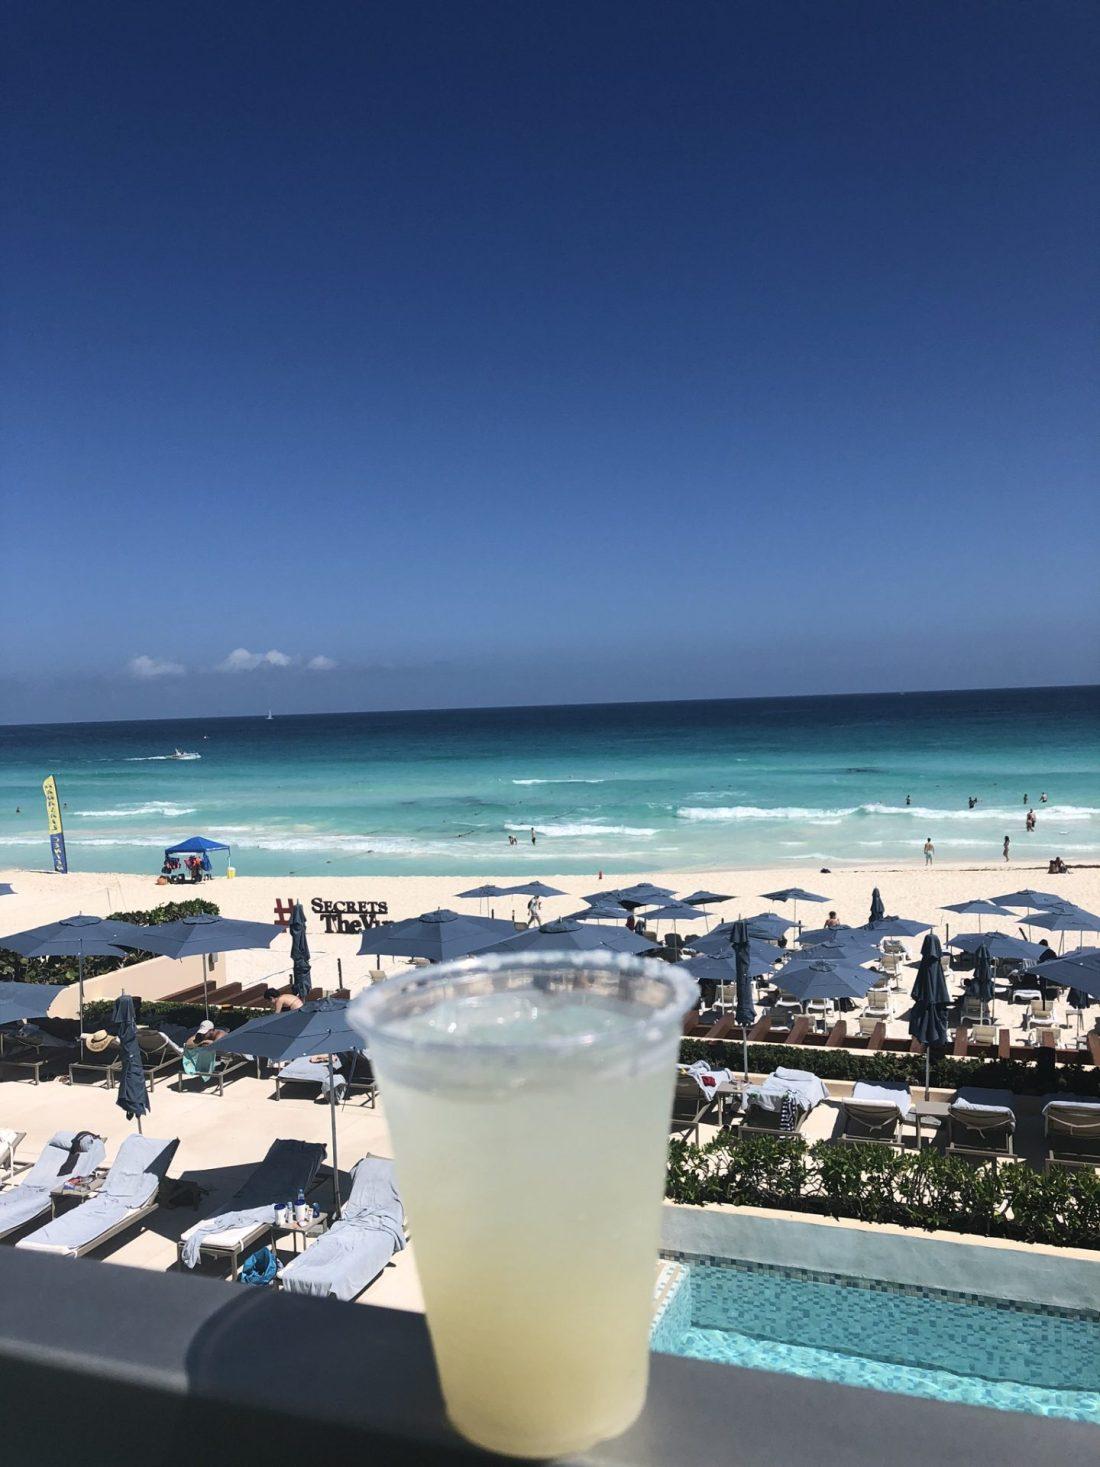 A margarita on the beach in Cancun